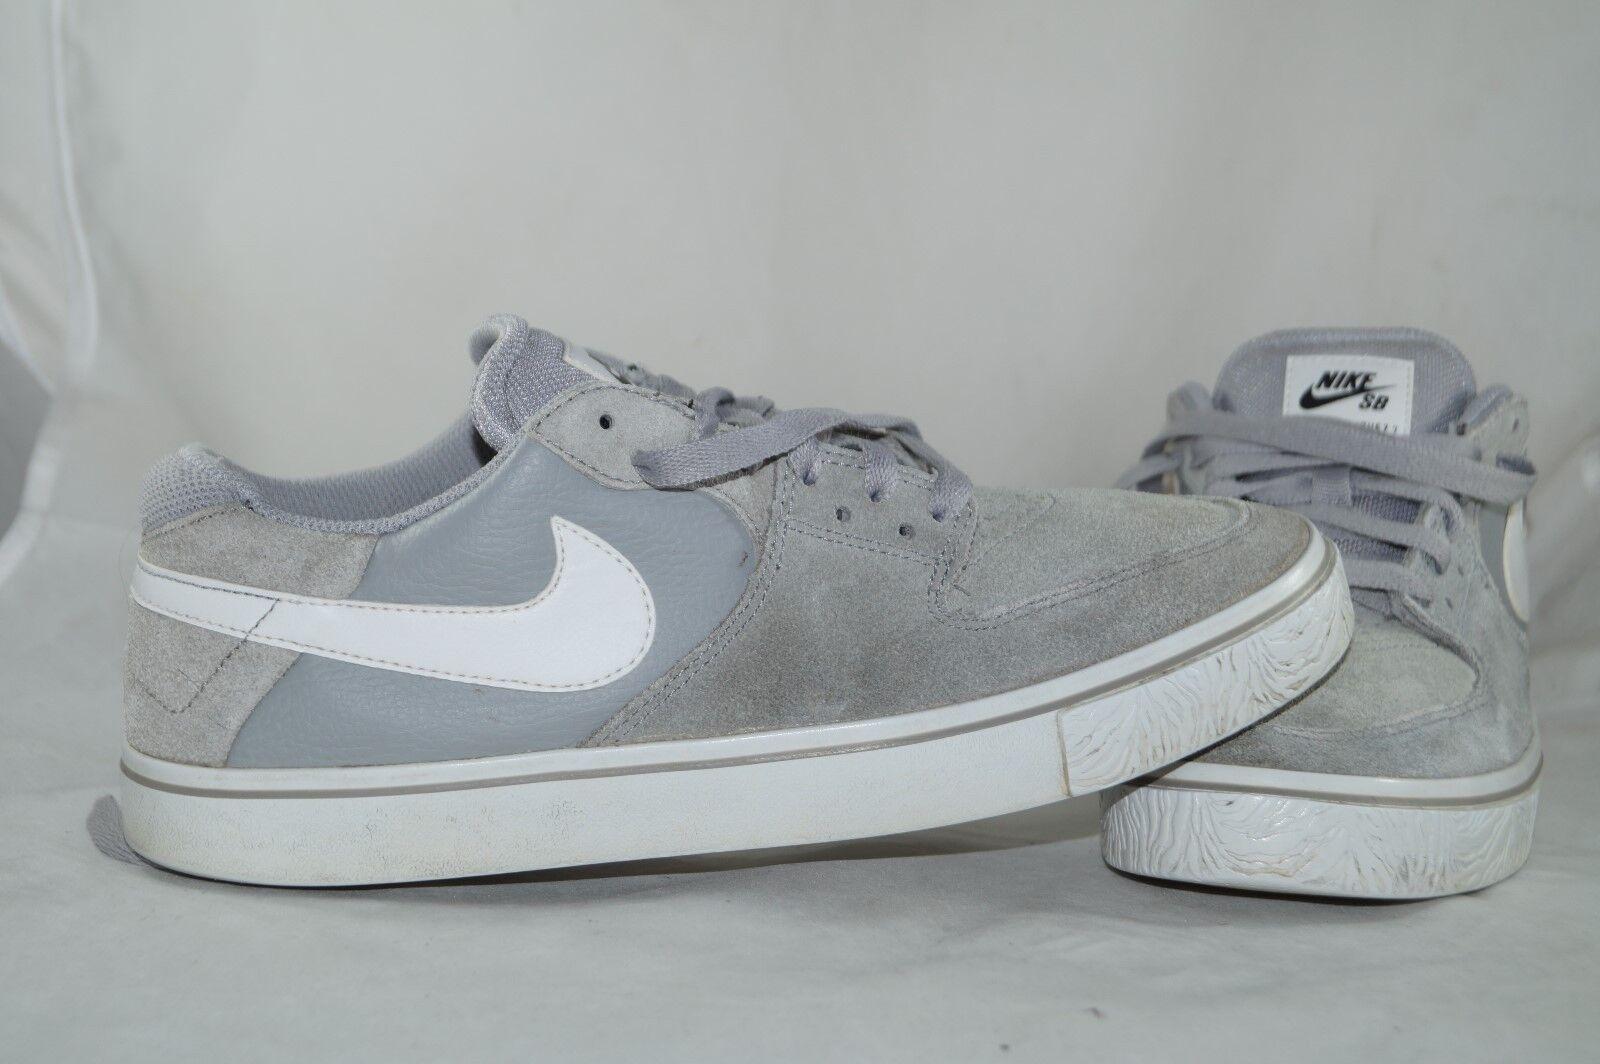 NIKE SB PAUL RODRIGUEZ 7 GR: 42,5 - 42 42 42 grigio low Tops Scarpe Skater | caratteristica  | Uomini/Donne Scarpa  | Uomo/Donna Scarpa  211748